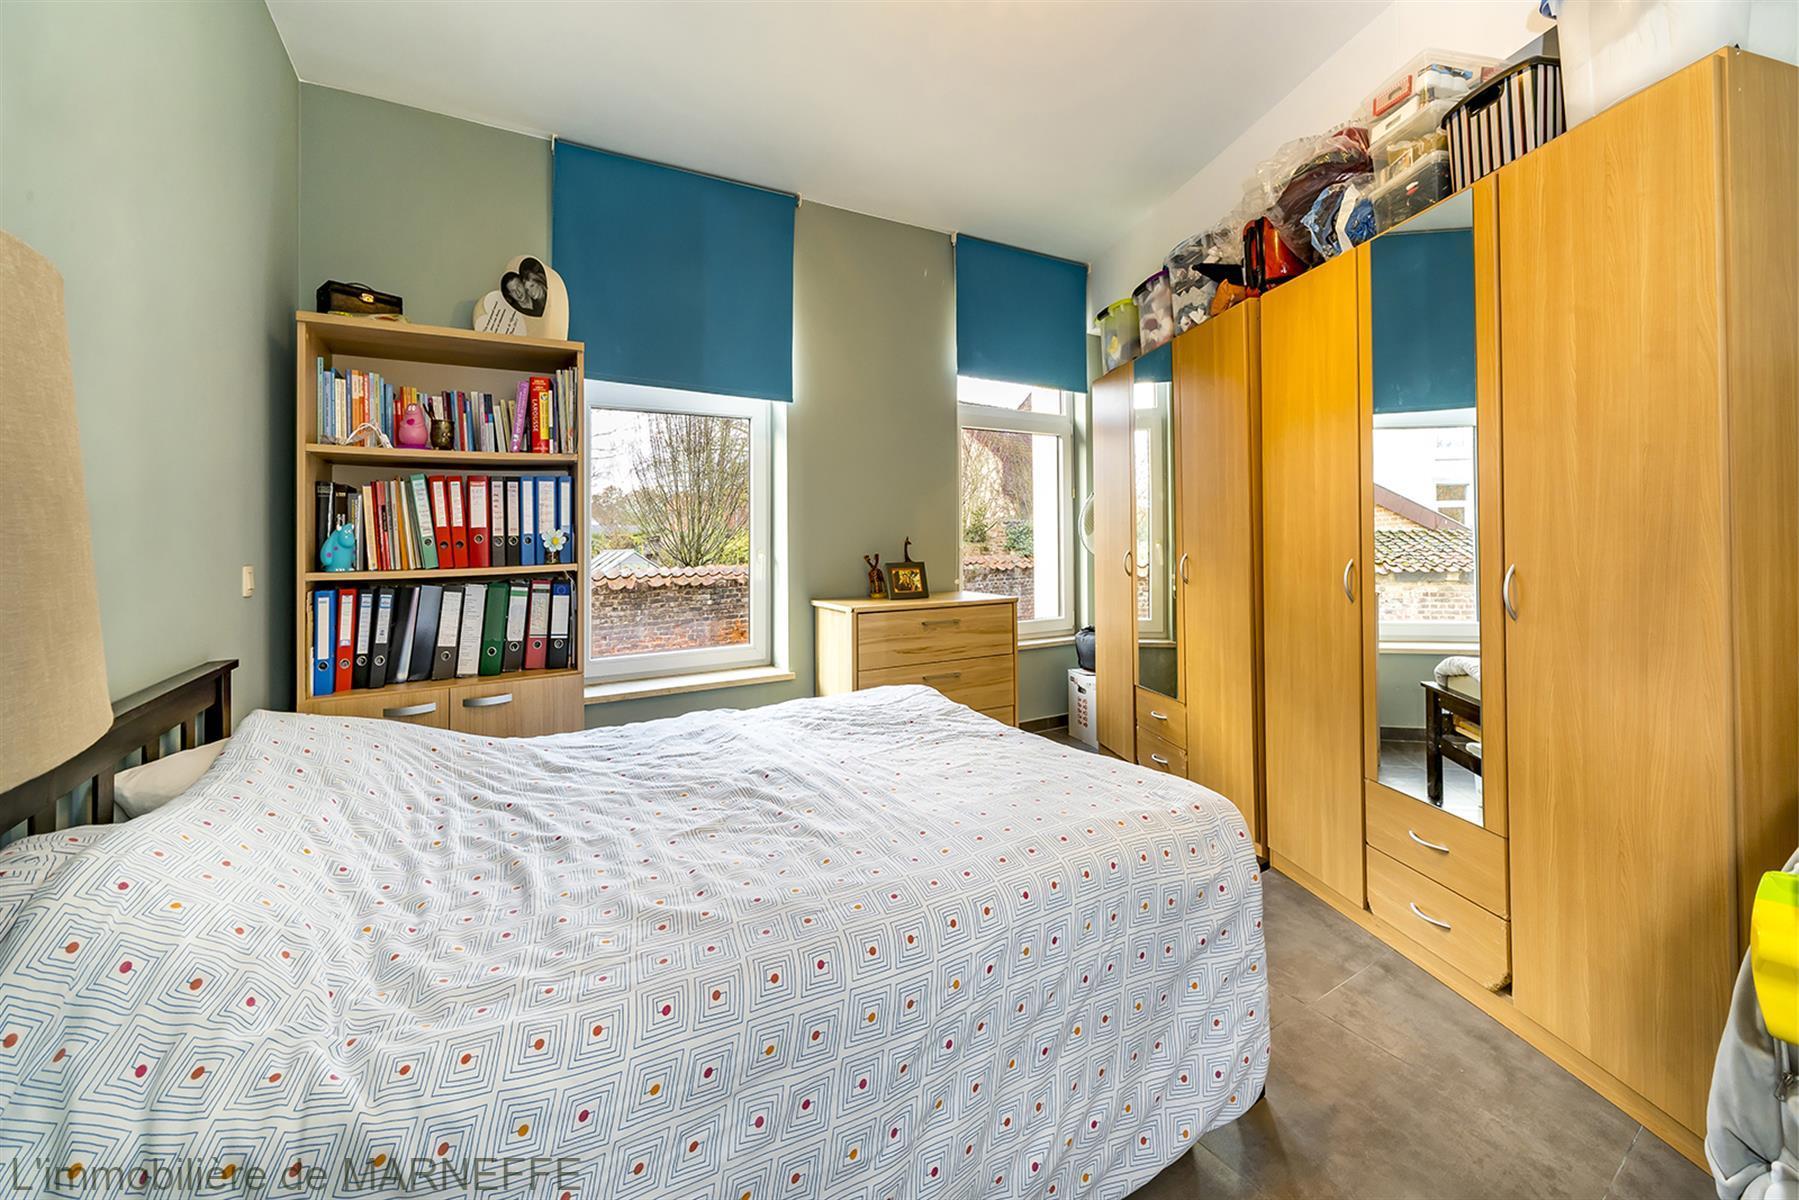 Appartement avec jardin - Orp-Jauche - #3625402-11